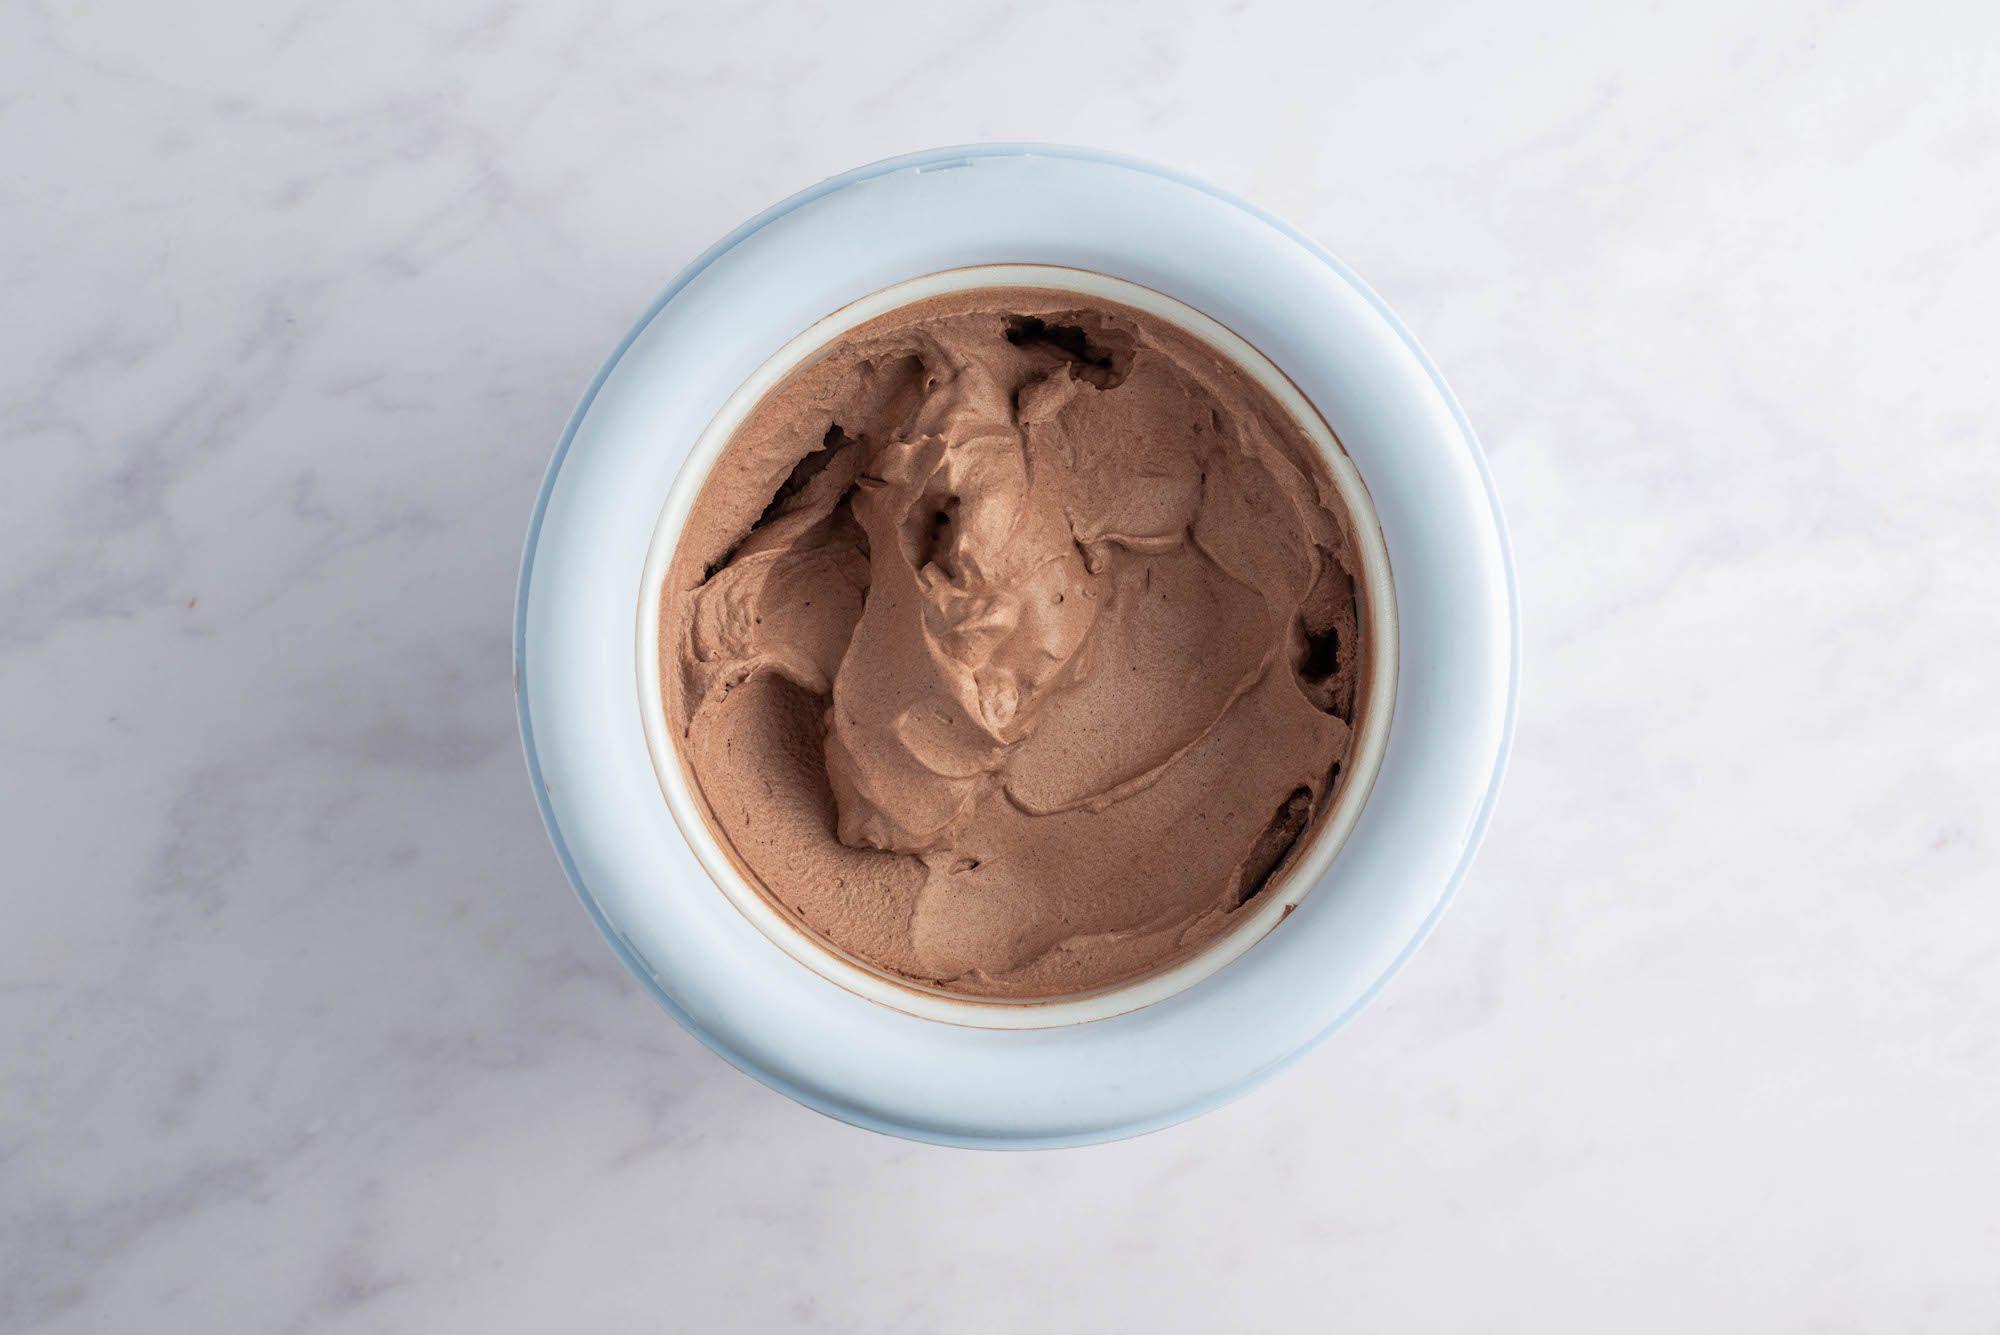 Freeze chocolate ice cream